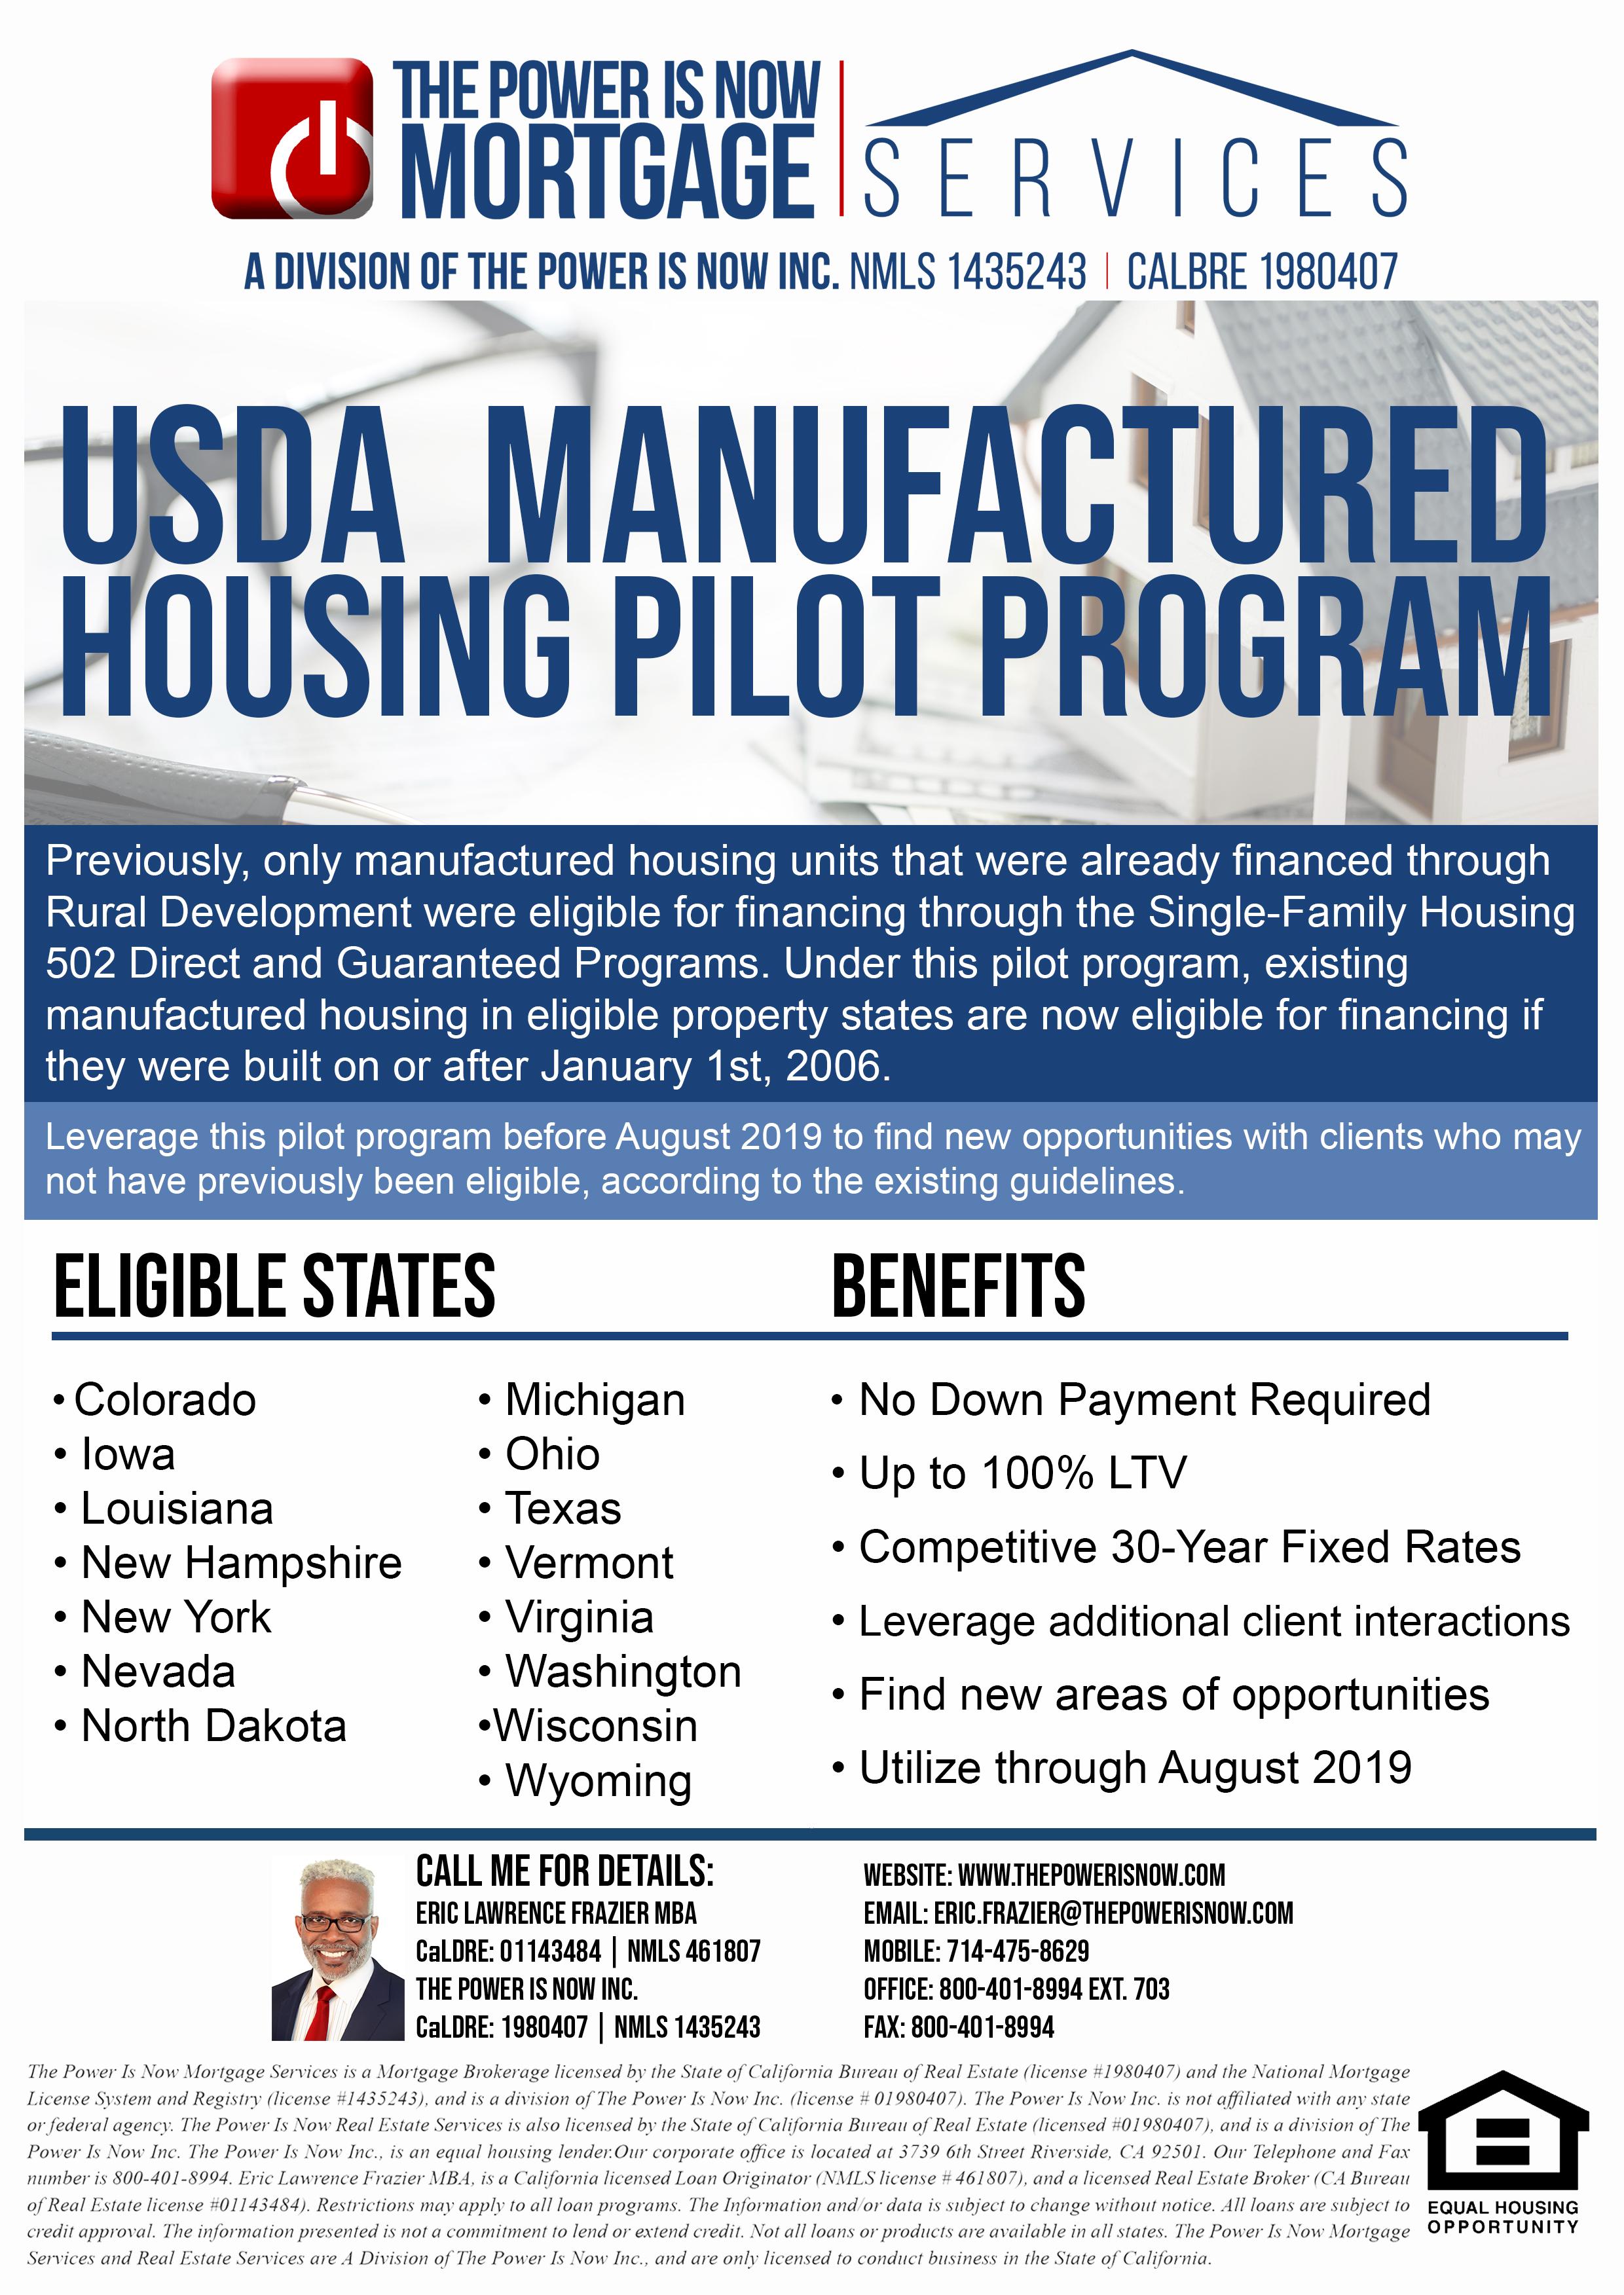 USDA manufactured housing pilot program